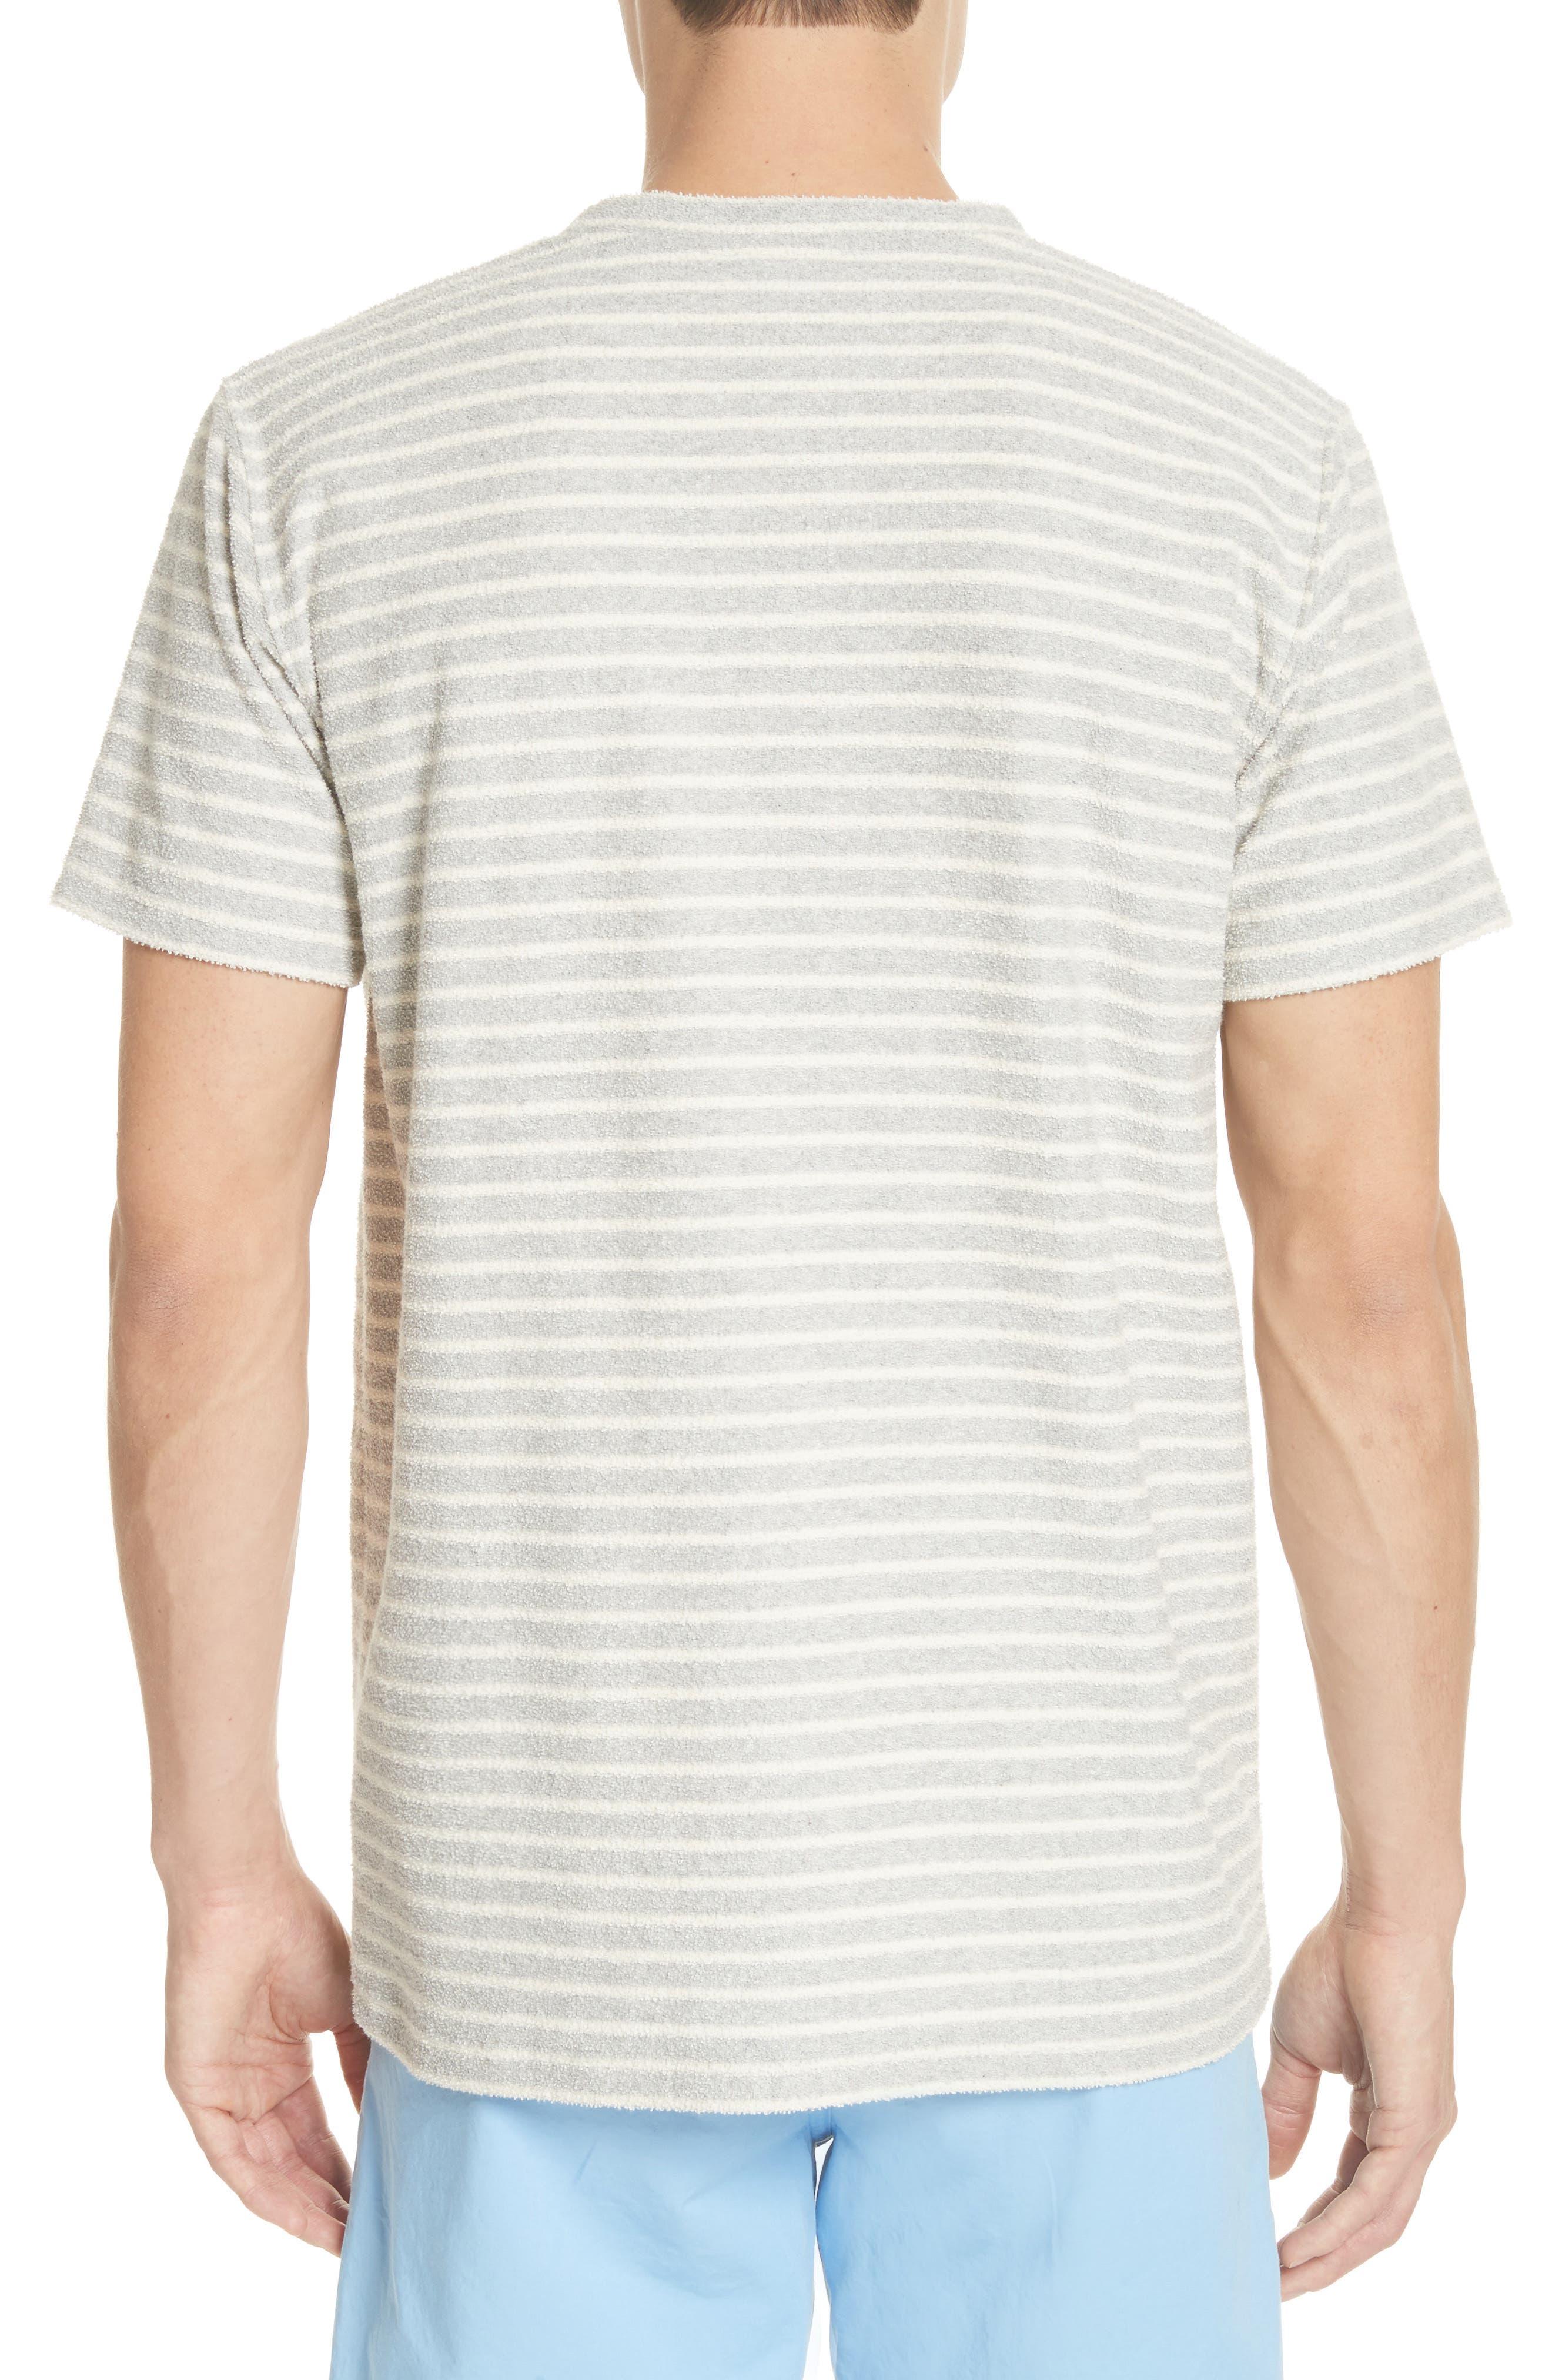 Niels Stripe Pocket T-Shirt,                             Alternate thumbnail 2, color,                             050